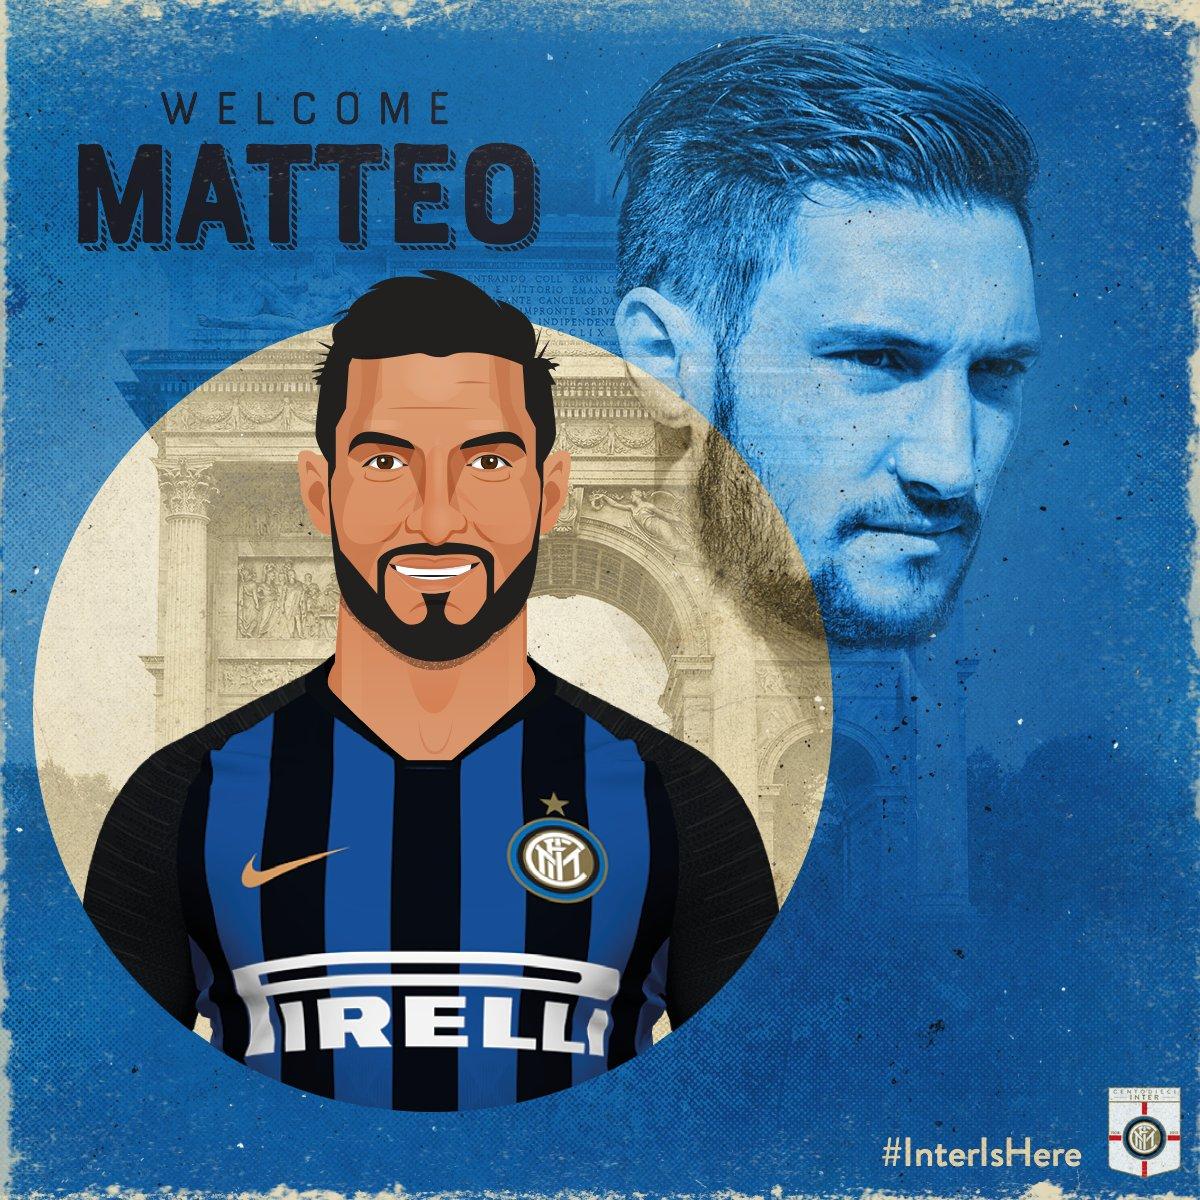 UFFICIALE! 🙌✍🏼 @MPolitano16 ⚫️🔵 👉 bit.ly/2lJJc1F #WelcomeMatteo #InterIsHere